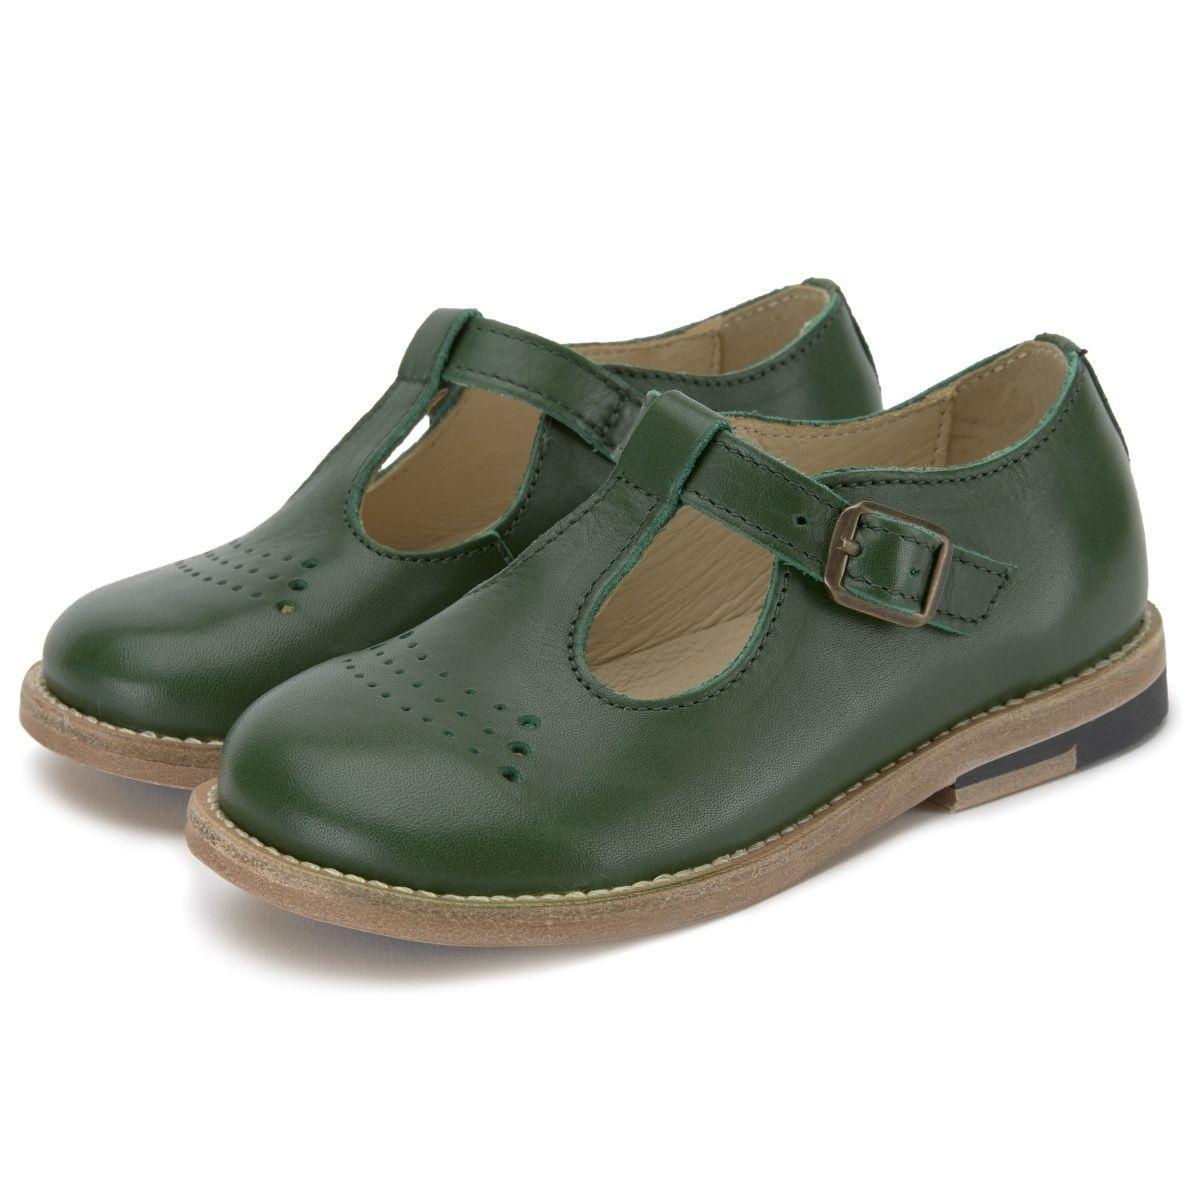 Young Soles Półbuty Dottie Leather zielone